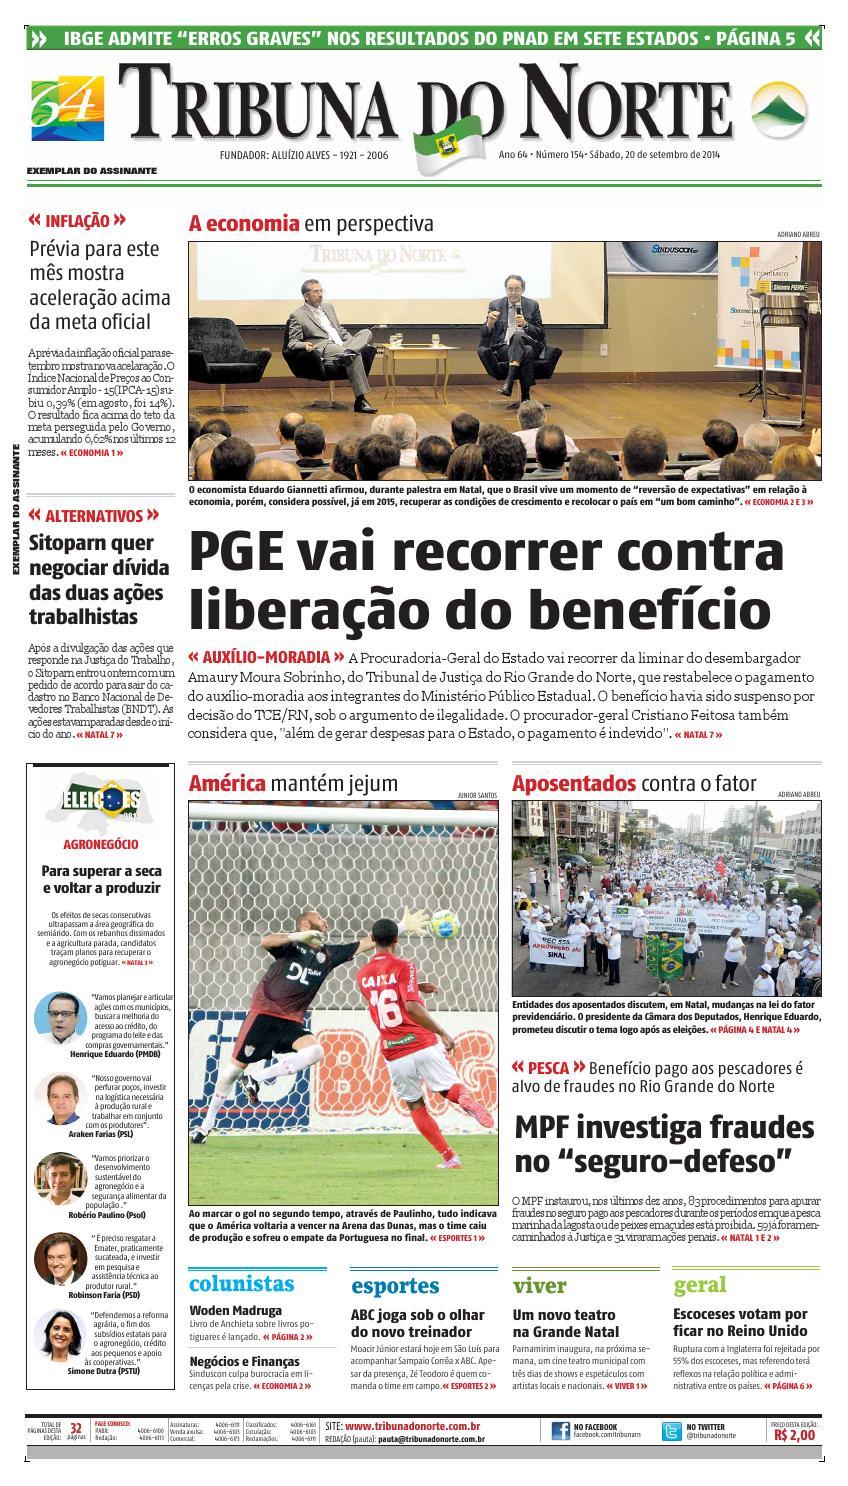 99385faecf Tribuna do Norte - 20 09 2014 by Empresa Jornalística Tribuna do Norte Ltda  - issuu